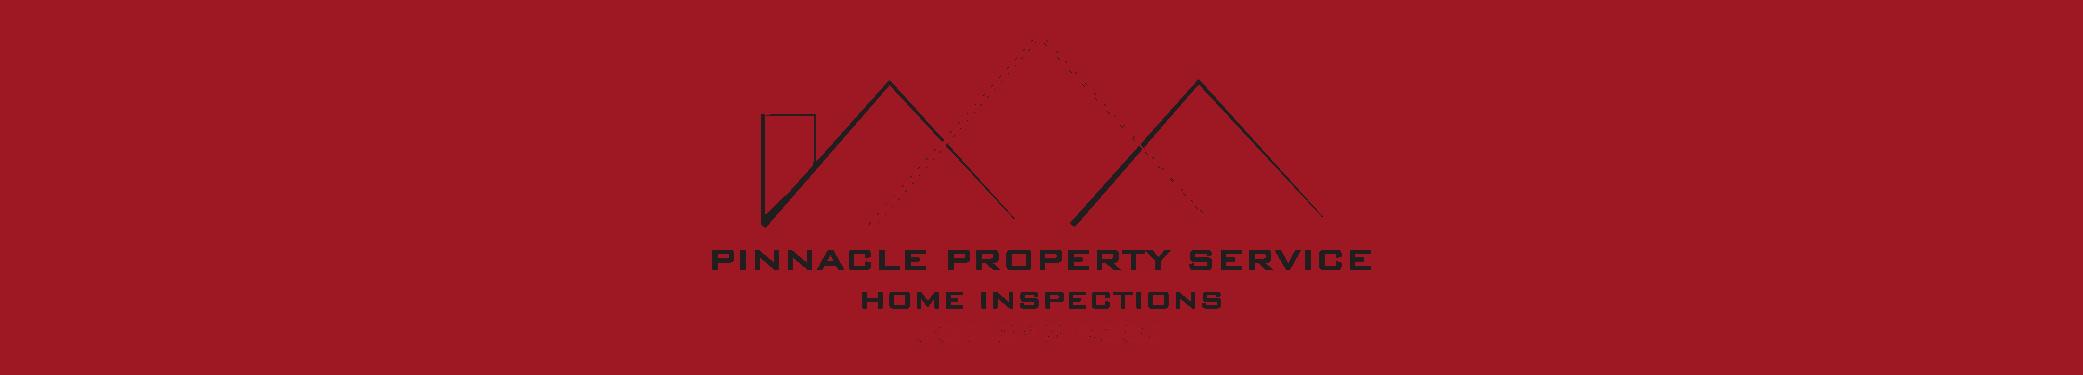 Pinnacle Property Service